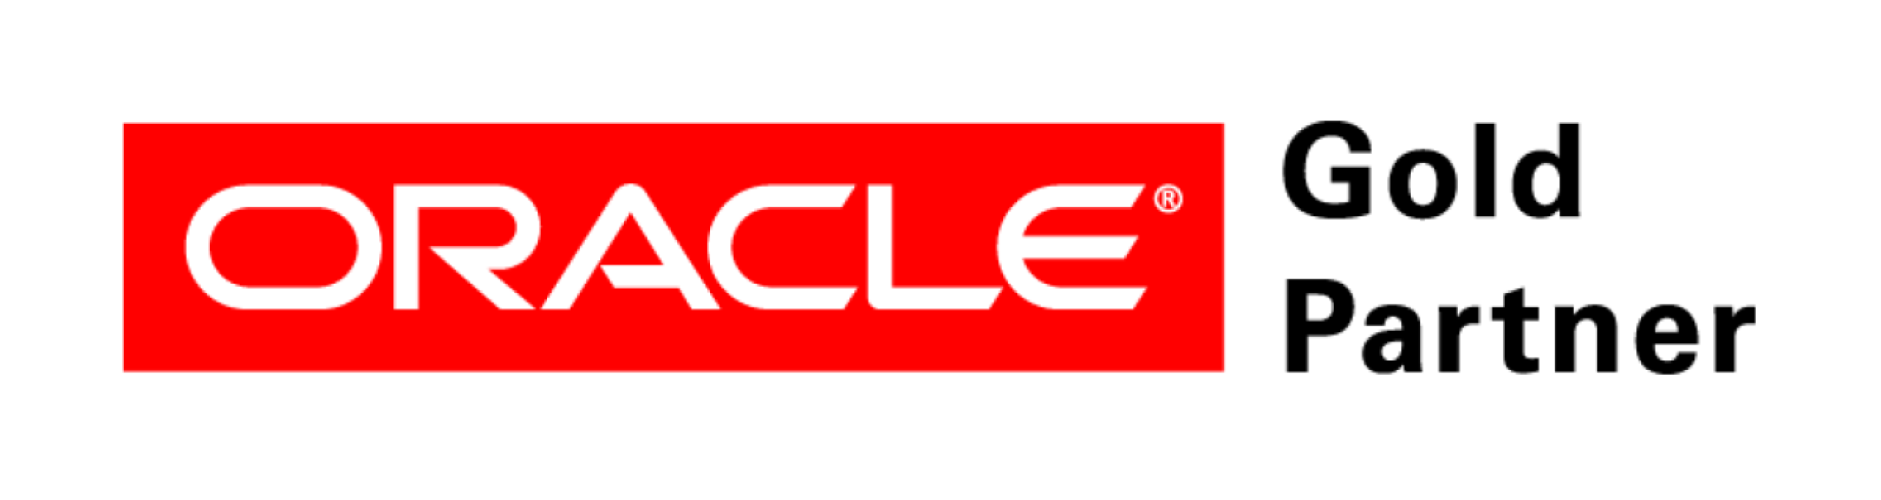 https://f.hubspotusercontent40.net/hubfs/2593044/Oracle%20Logos/O_GoldPartner_clr%201881%20500.png